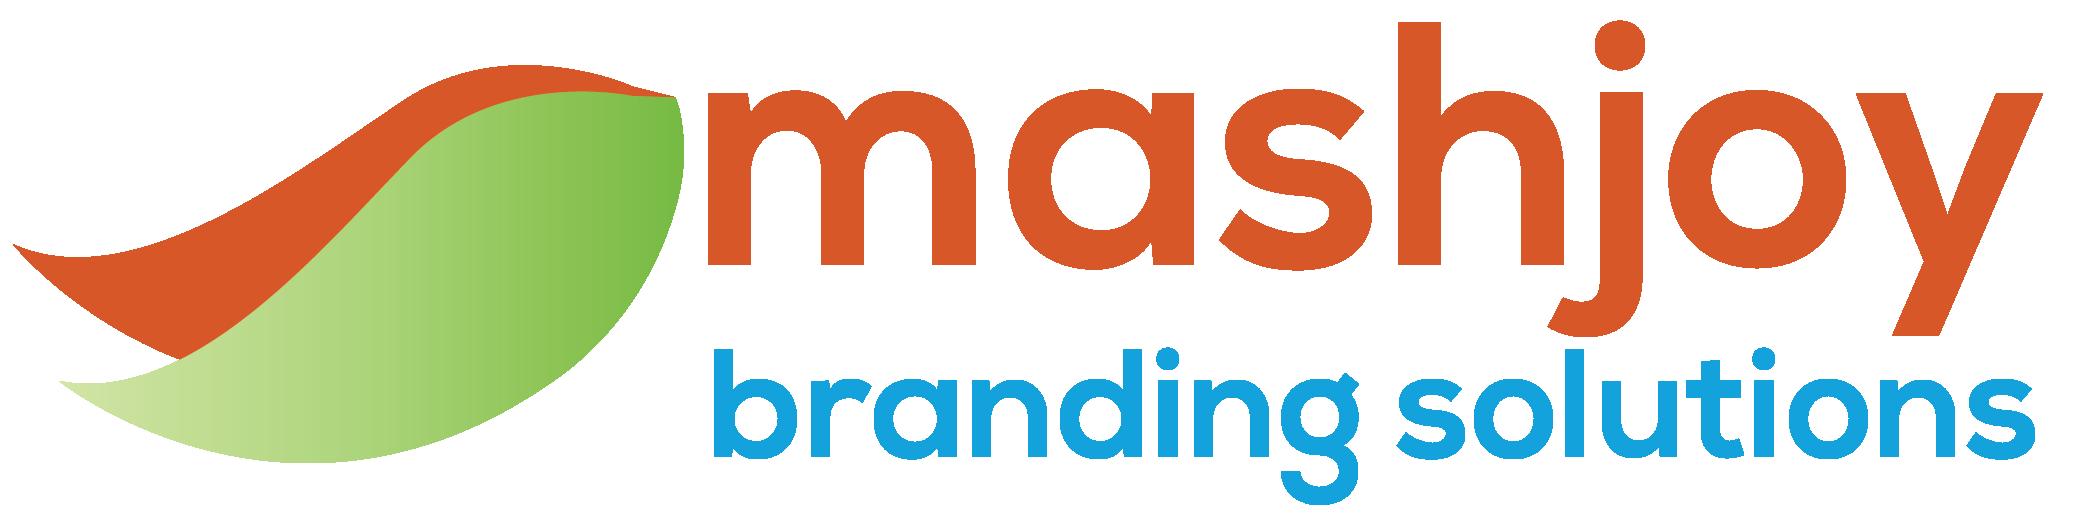 Mashjoy Branding Solutions